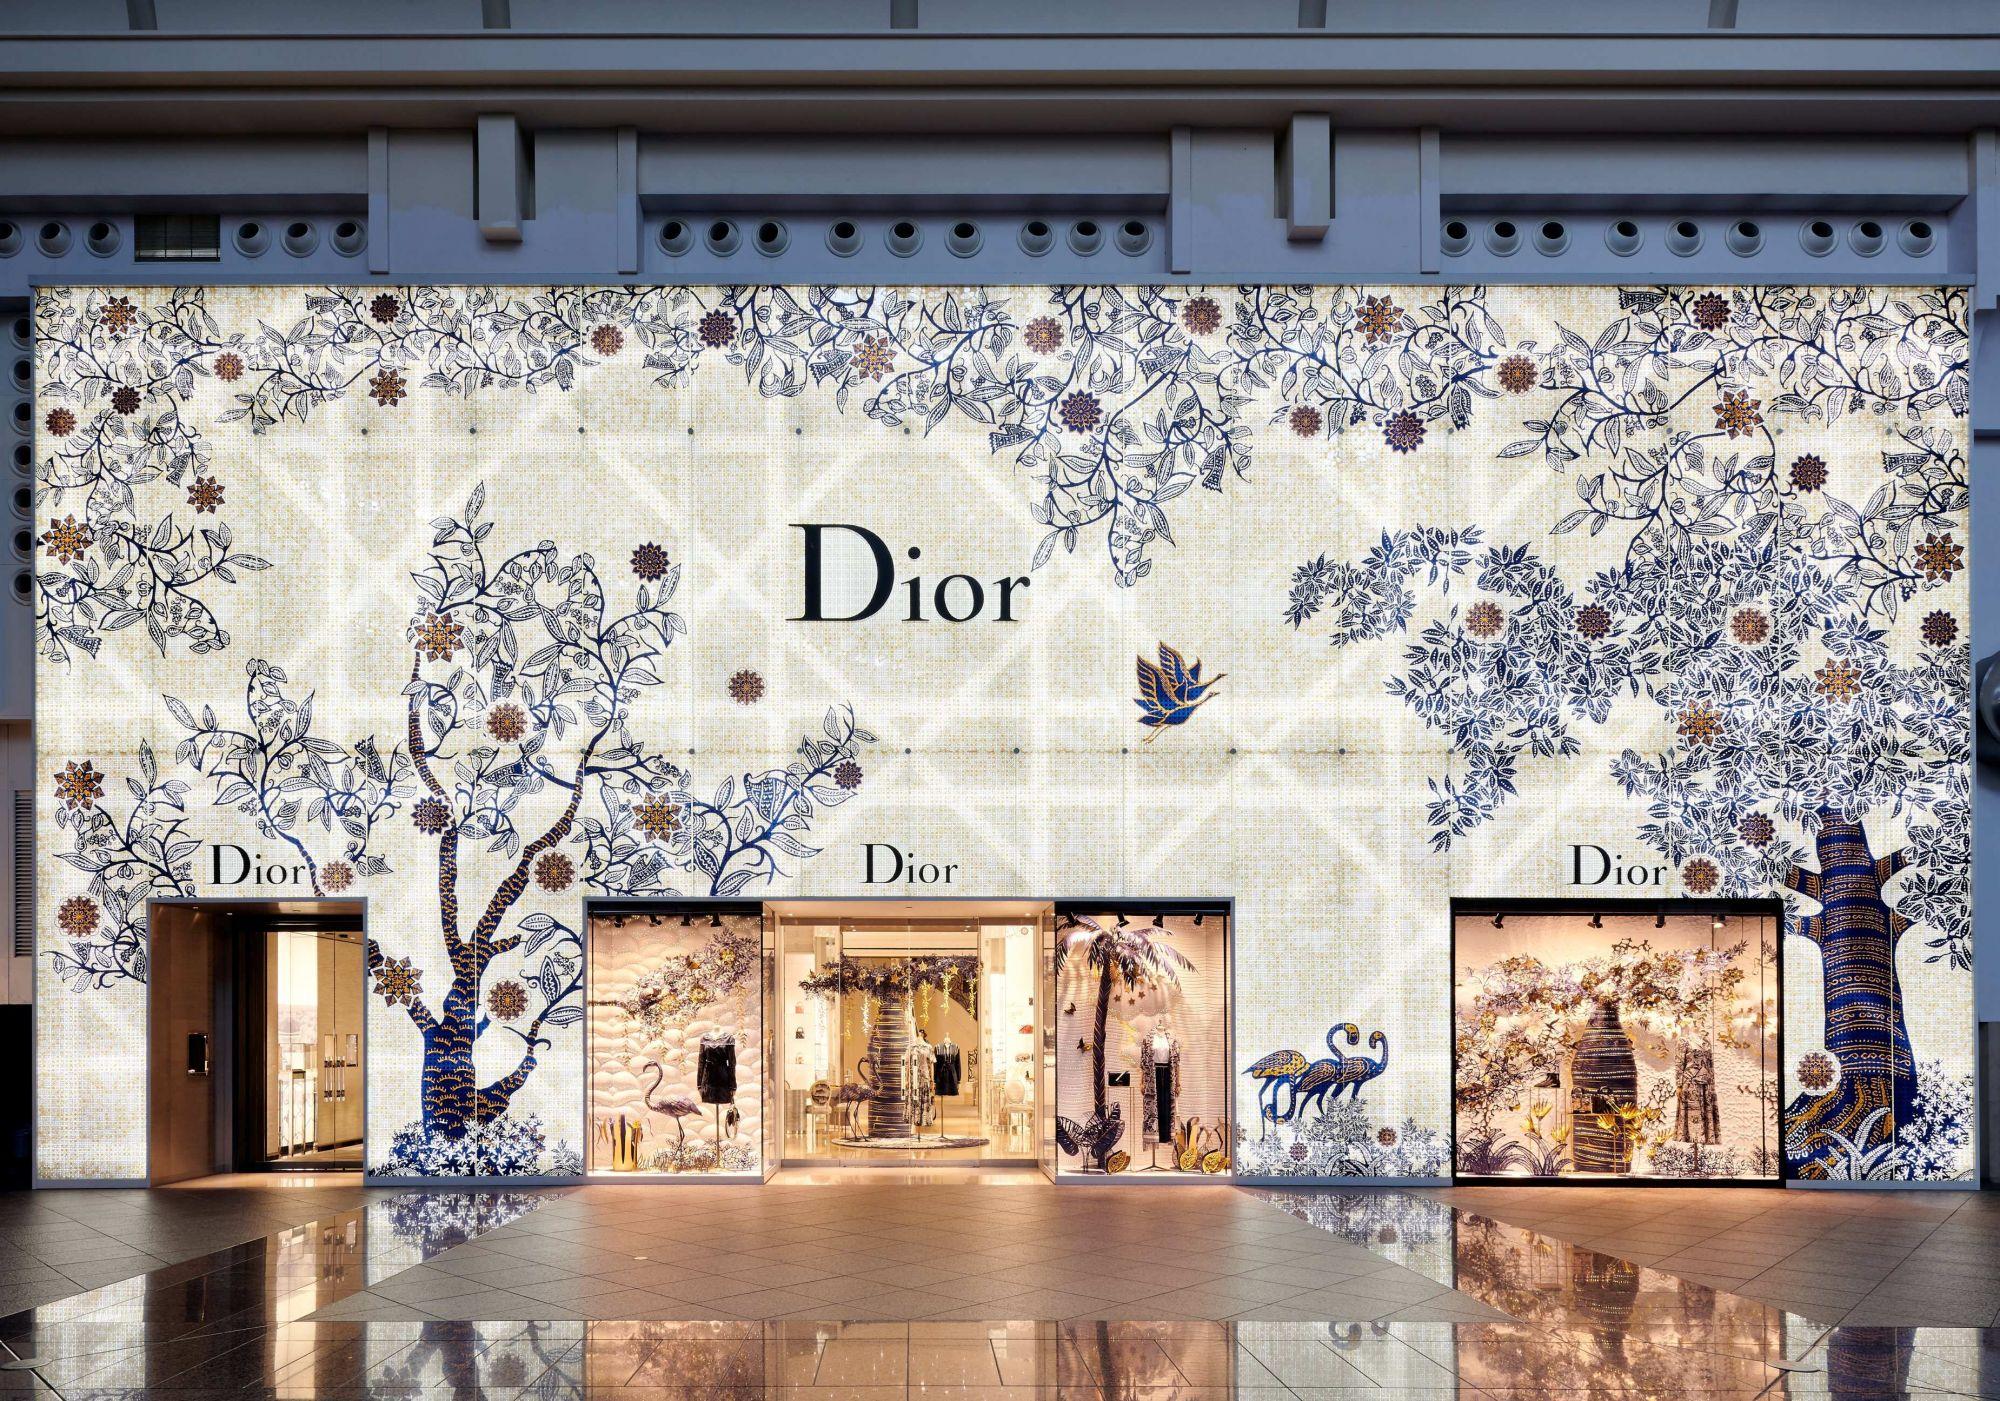 Dior 台北 101 精品店外觀(by Studio Millspace)